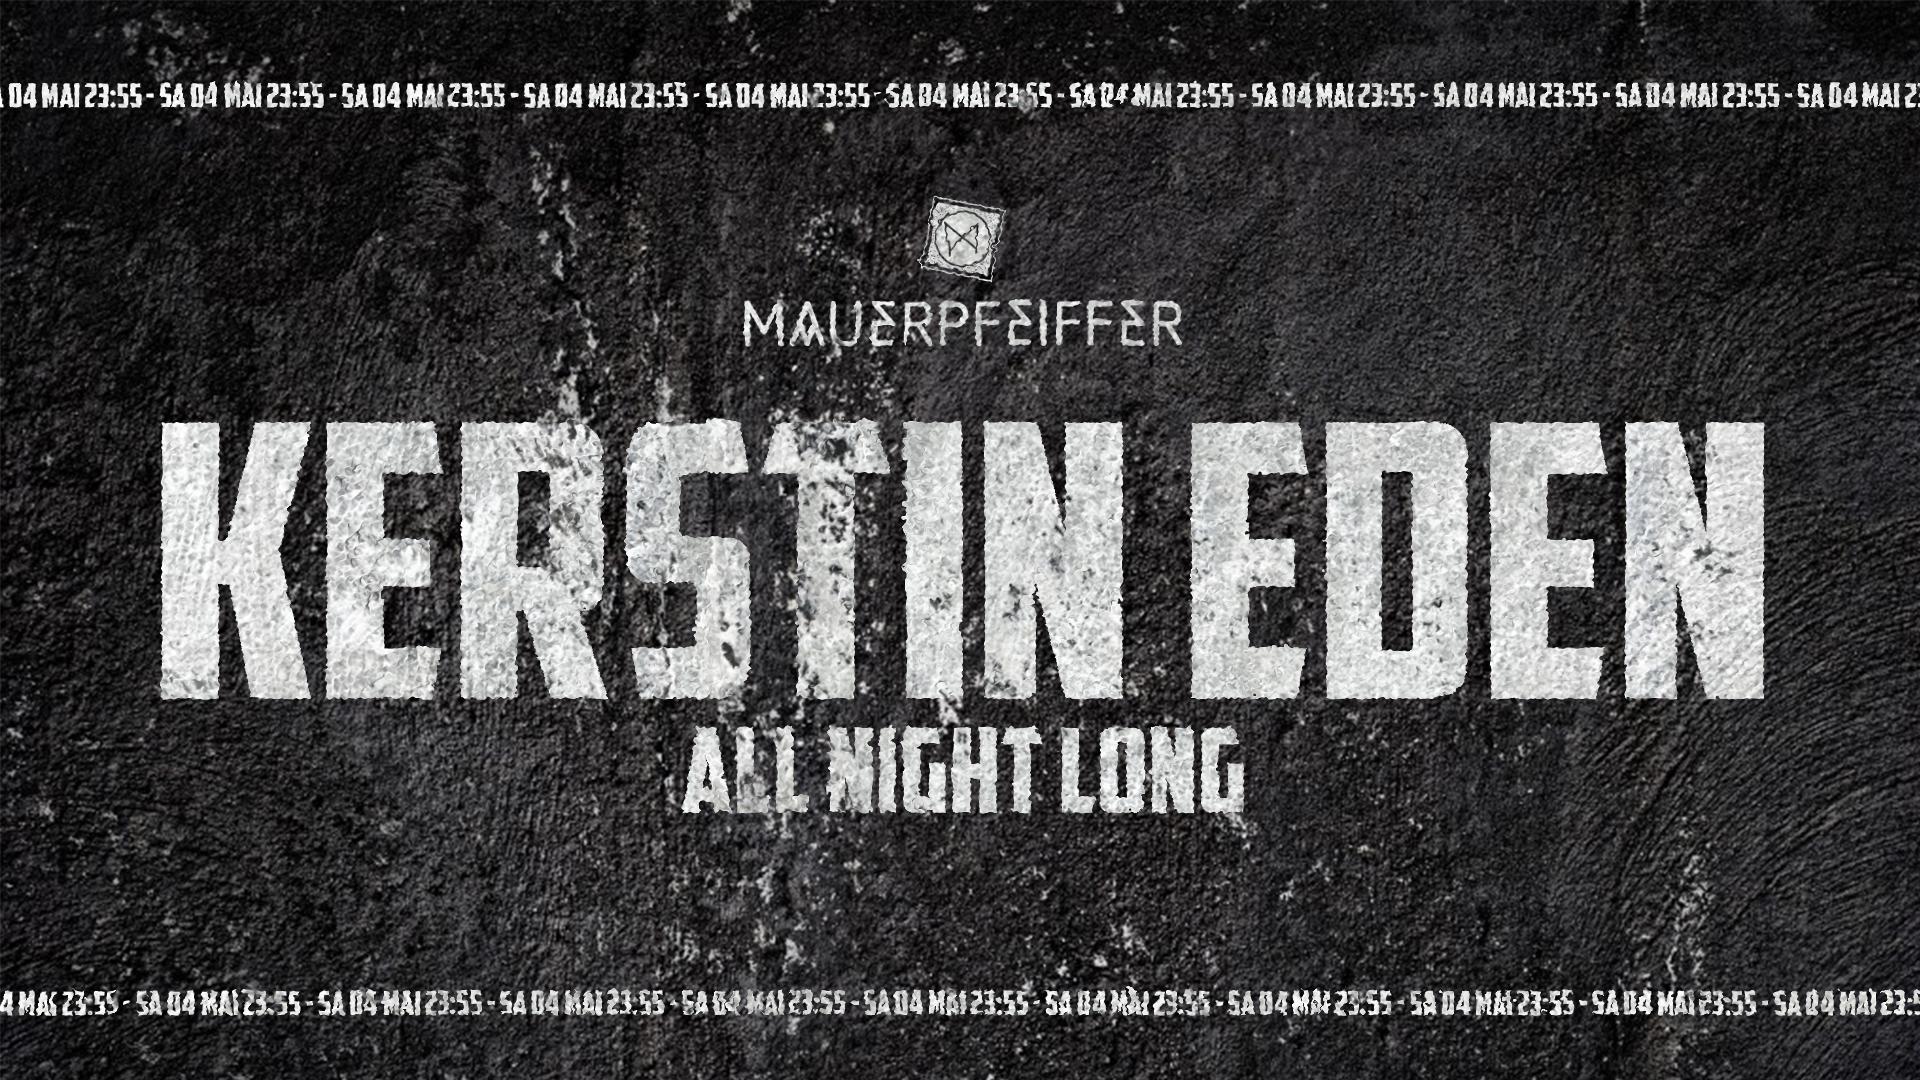 Kerstin Eden - all night long